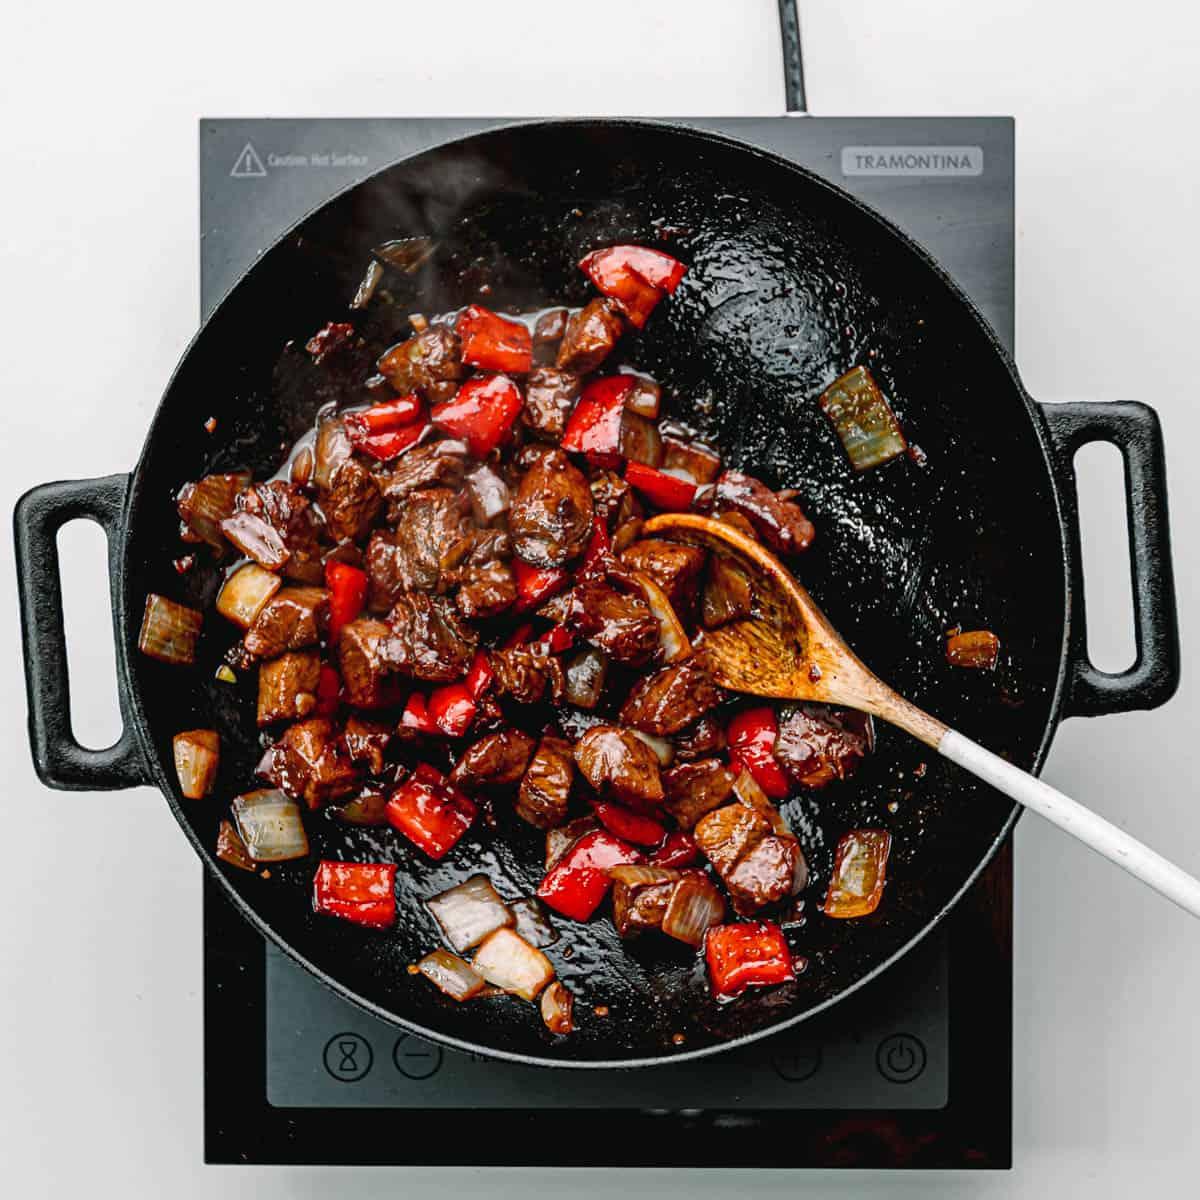 Vietnamese beef stir fry.